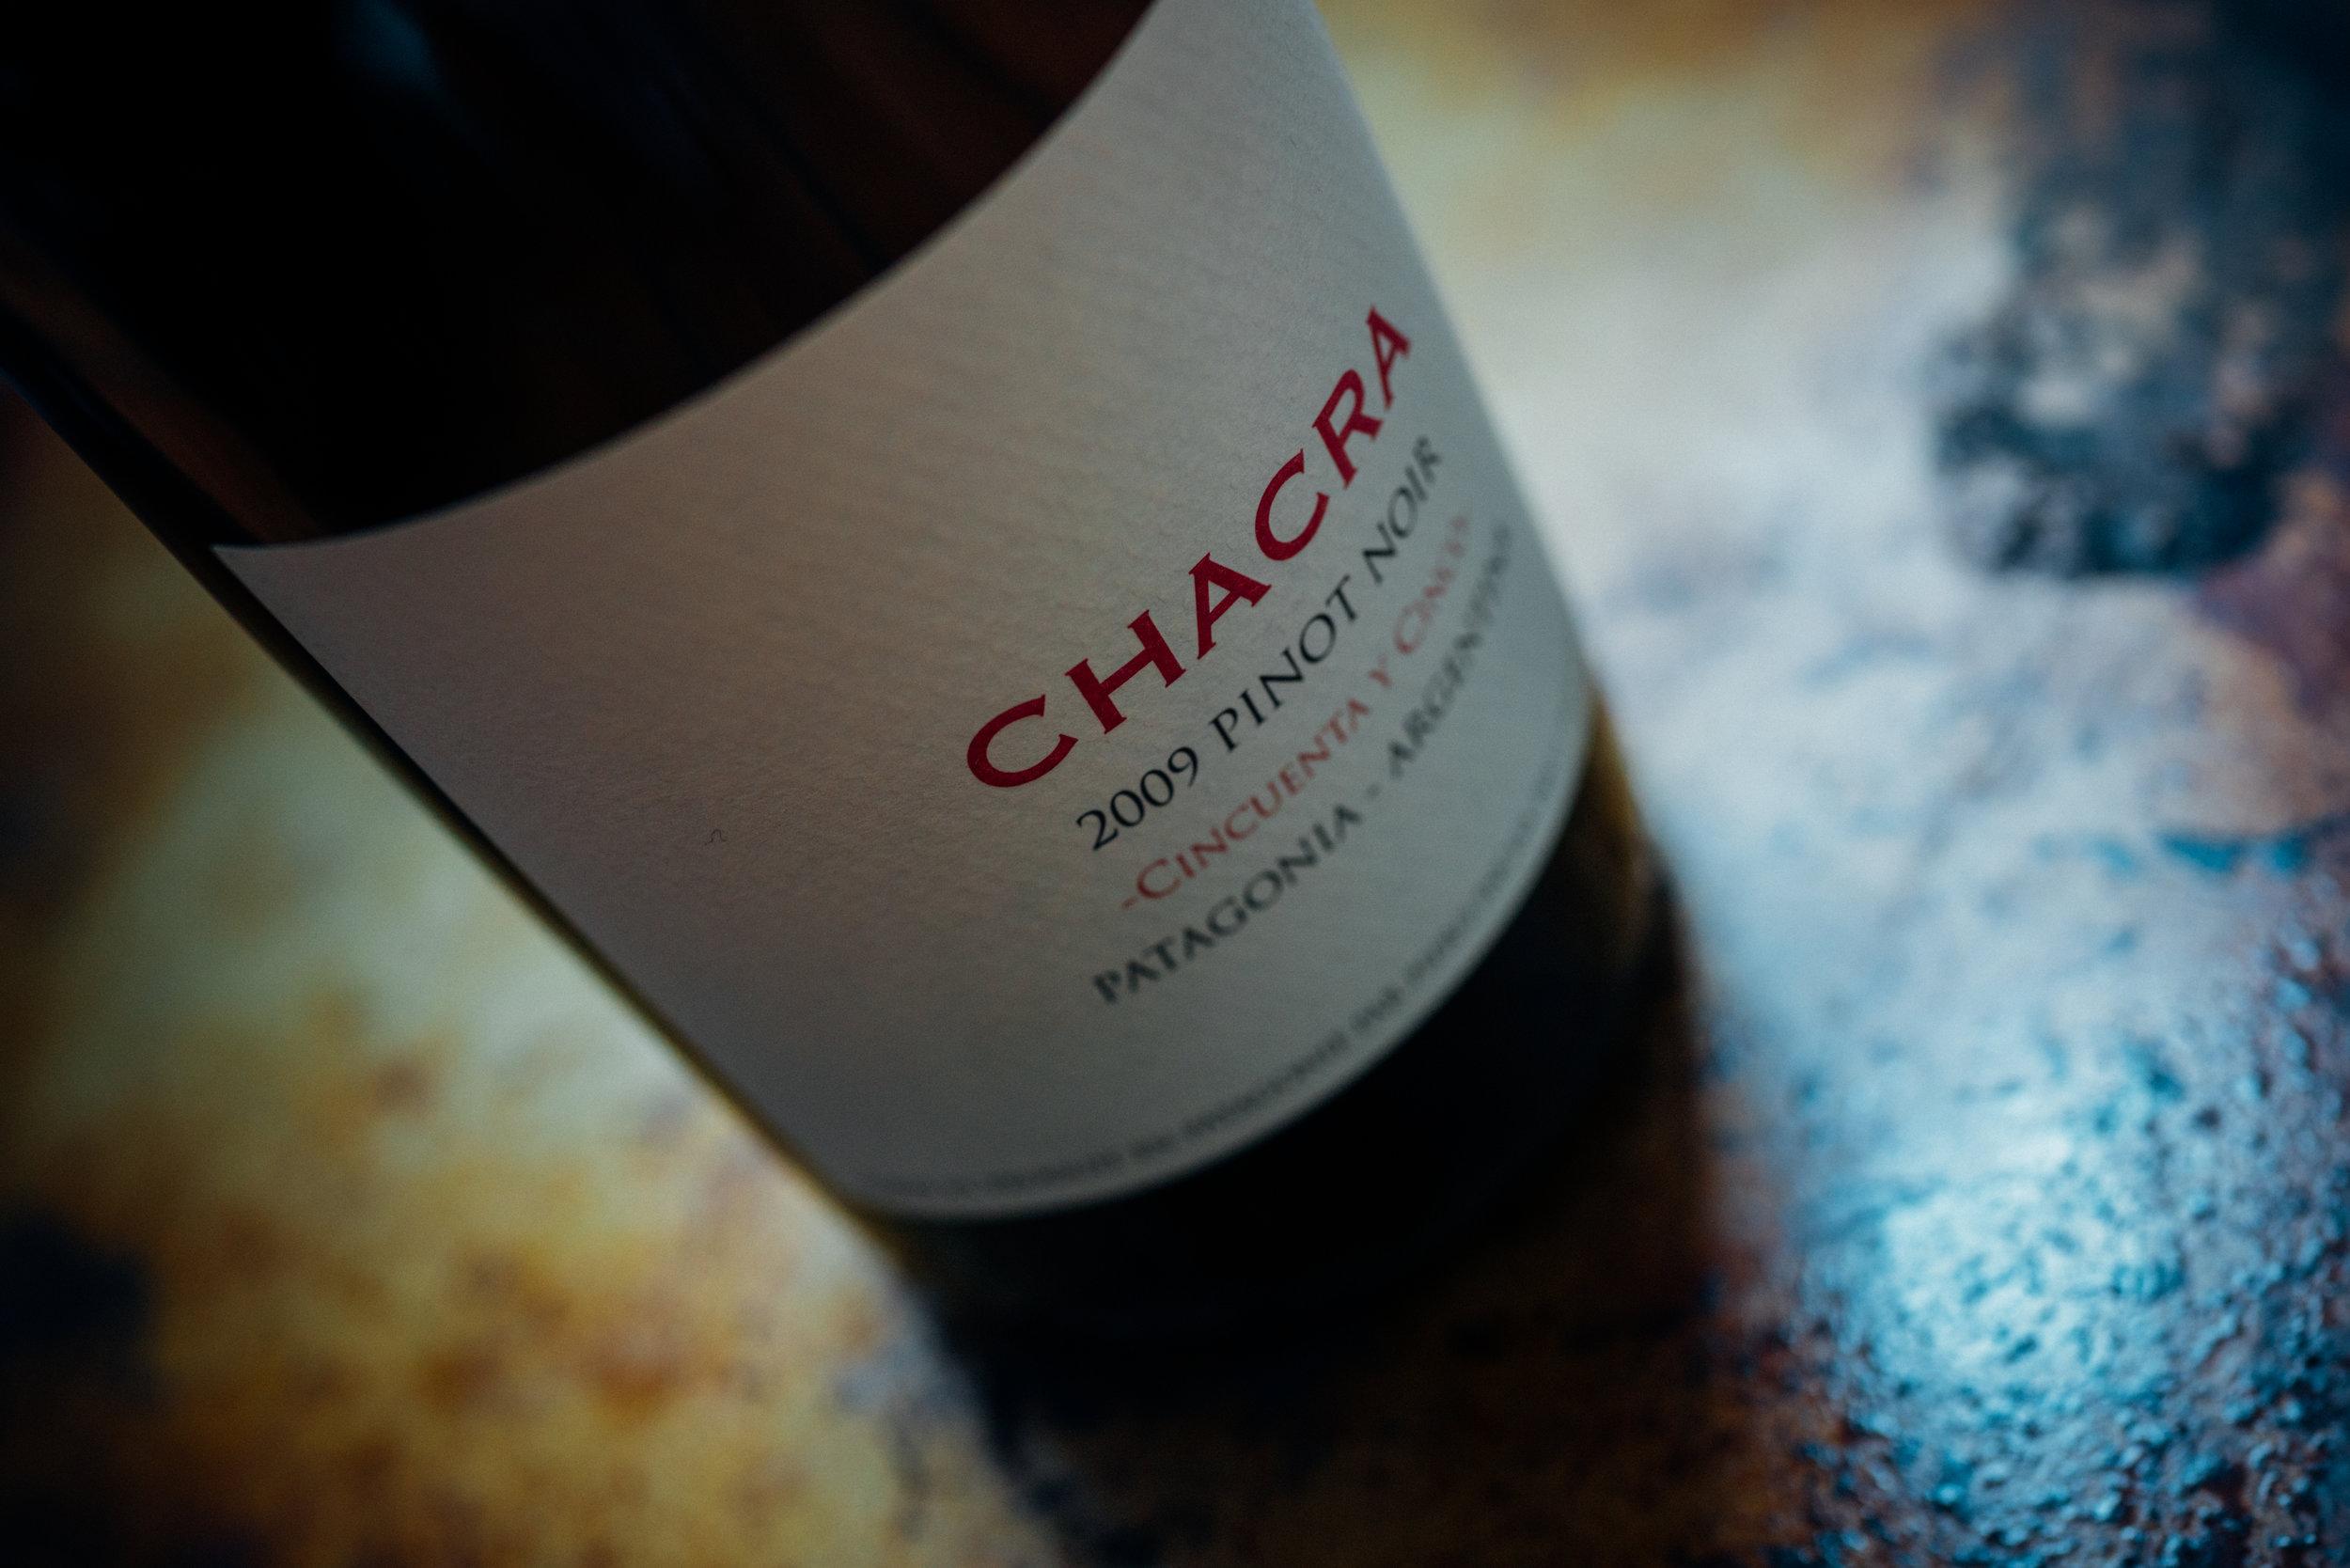 2009 Bodega Chacra  Cincuenta y Cinco  Pinot Noir